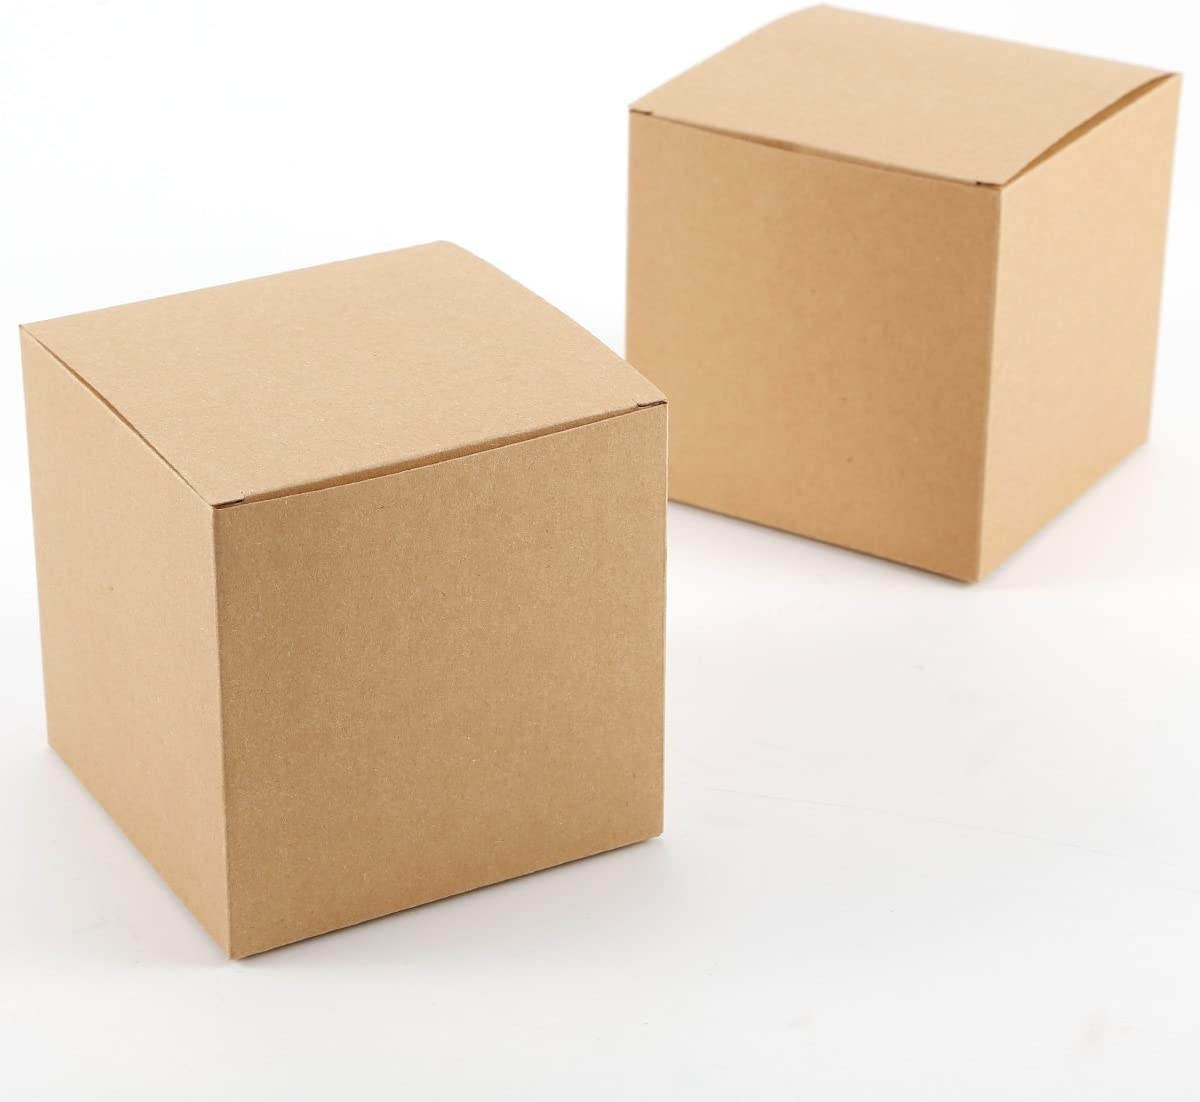 Set de 50 Cajas para dulces bombones Caja kraft de boda regalo Rútico 10x10x10cm Cajita de cuadro Grande Kraft Paper